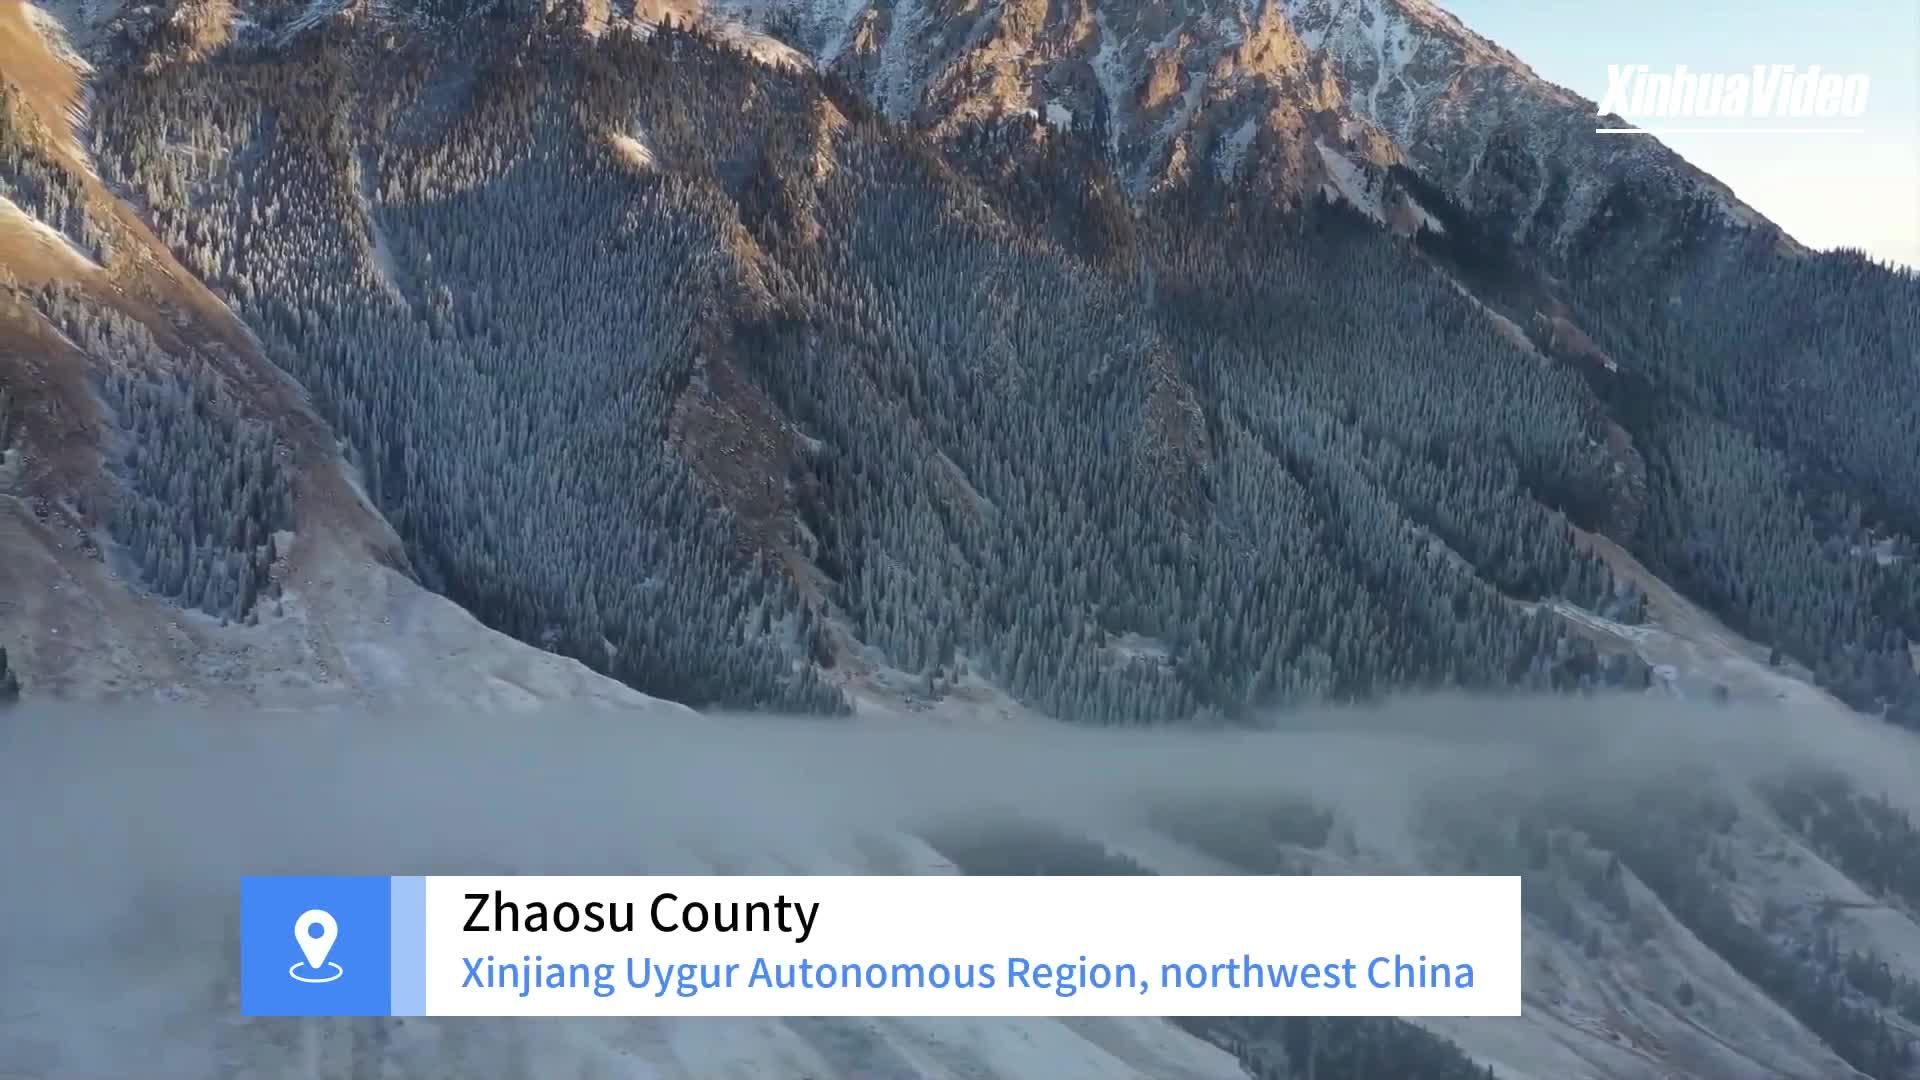 Winter scenery of Akyaz Valley in Xinjiang